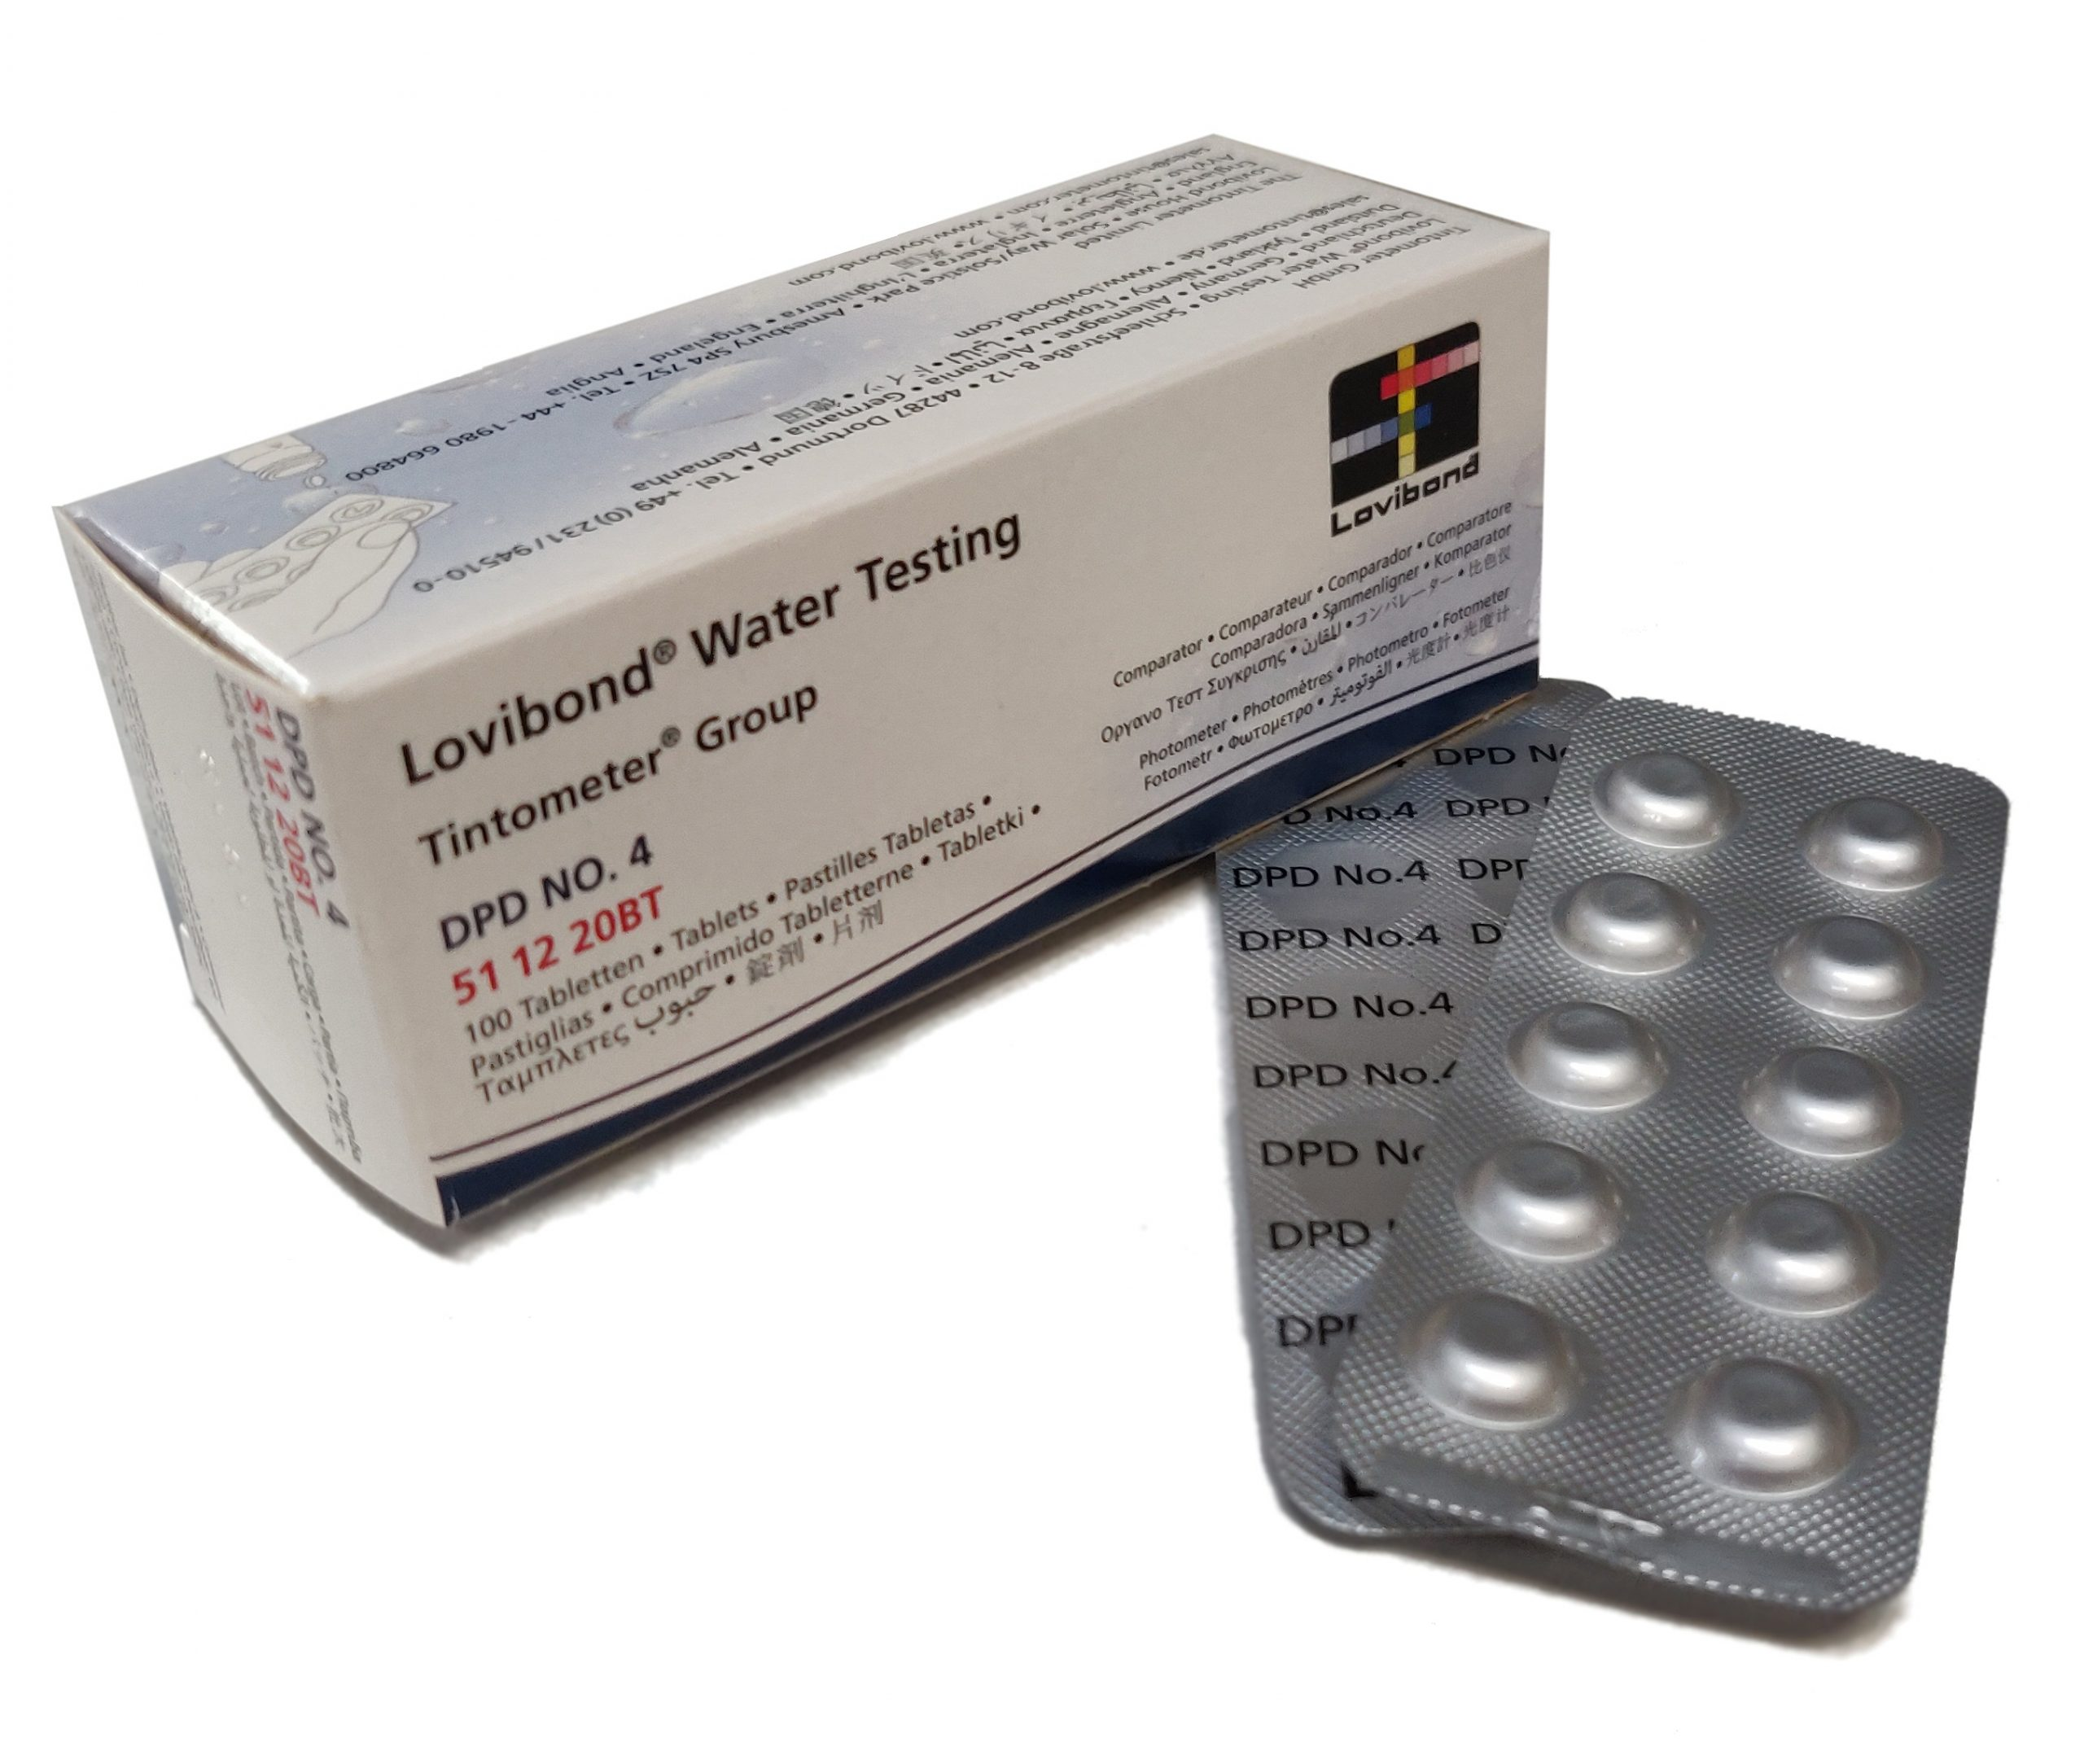 DPD nr. 4, Aktiv Oxygen 0,1-10 mg/l (Photometer)